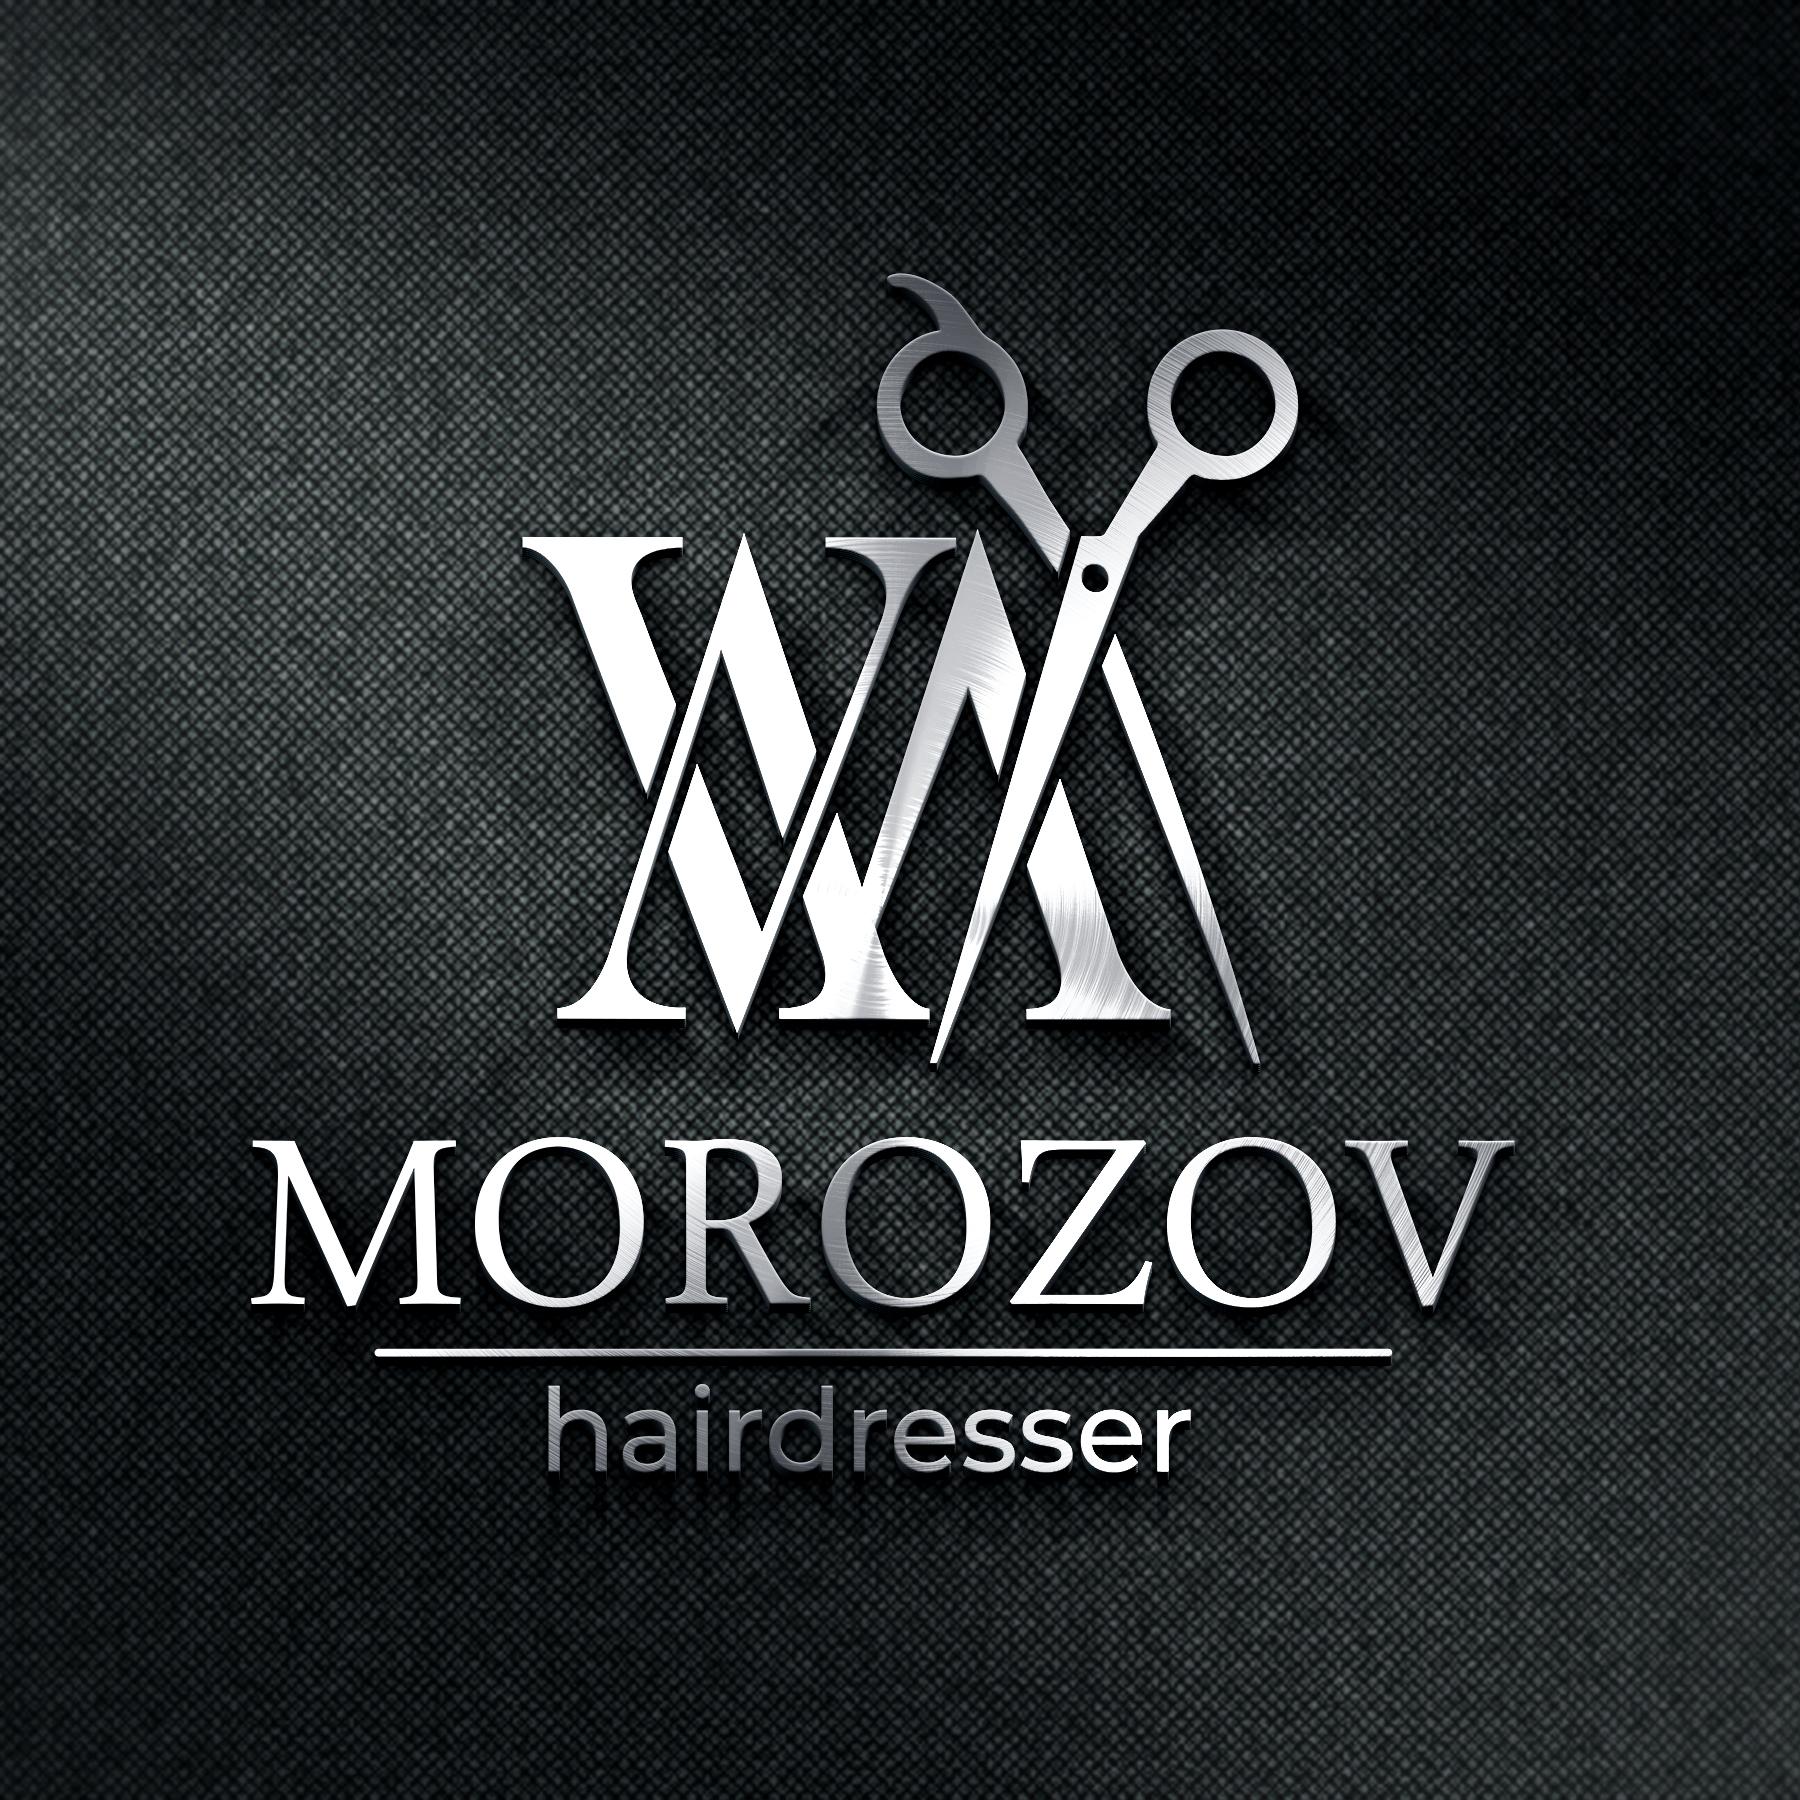 logo morozov hairdresser